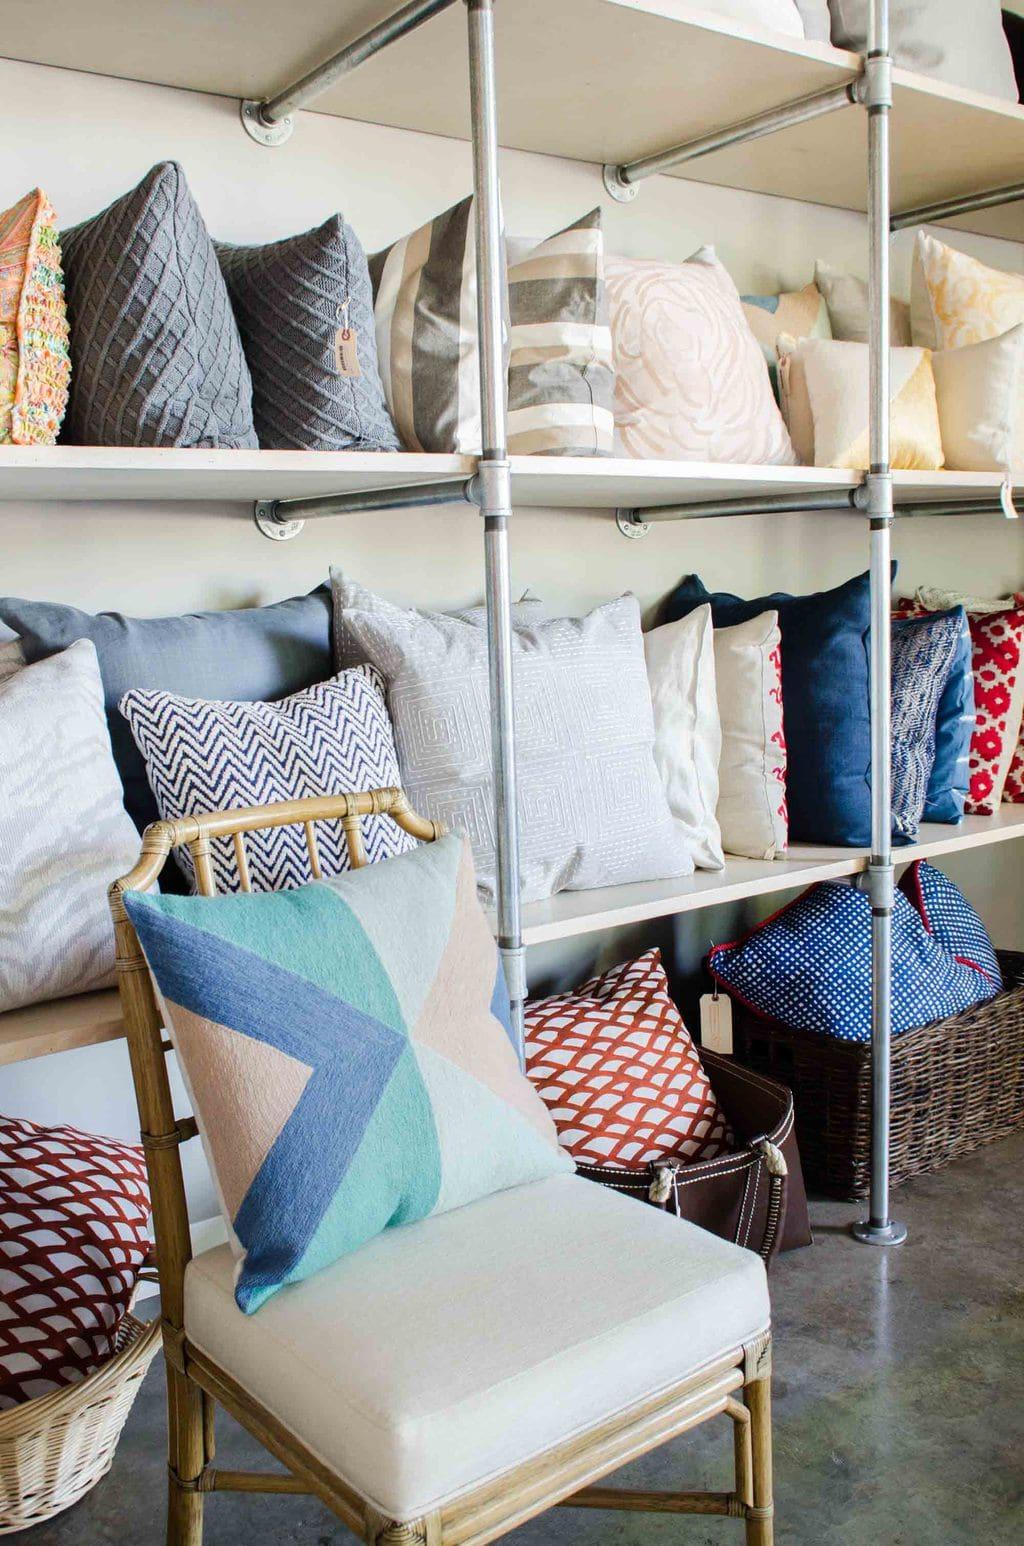 Inside Steve McKenzie's home decor shop in Atlanta on @thouswellblog